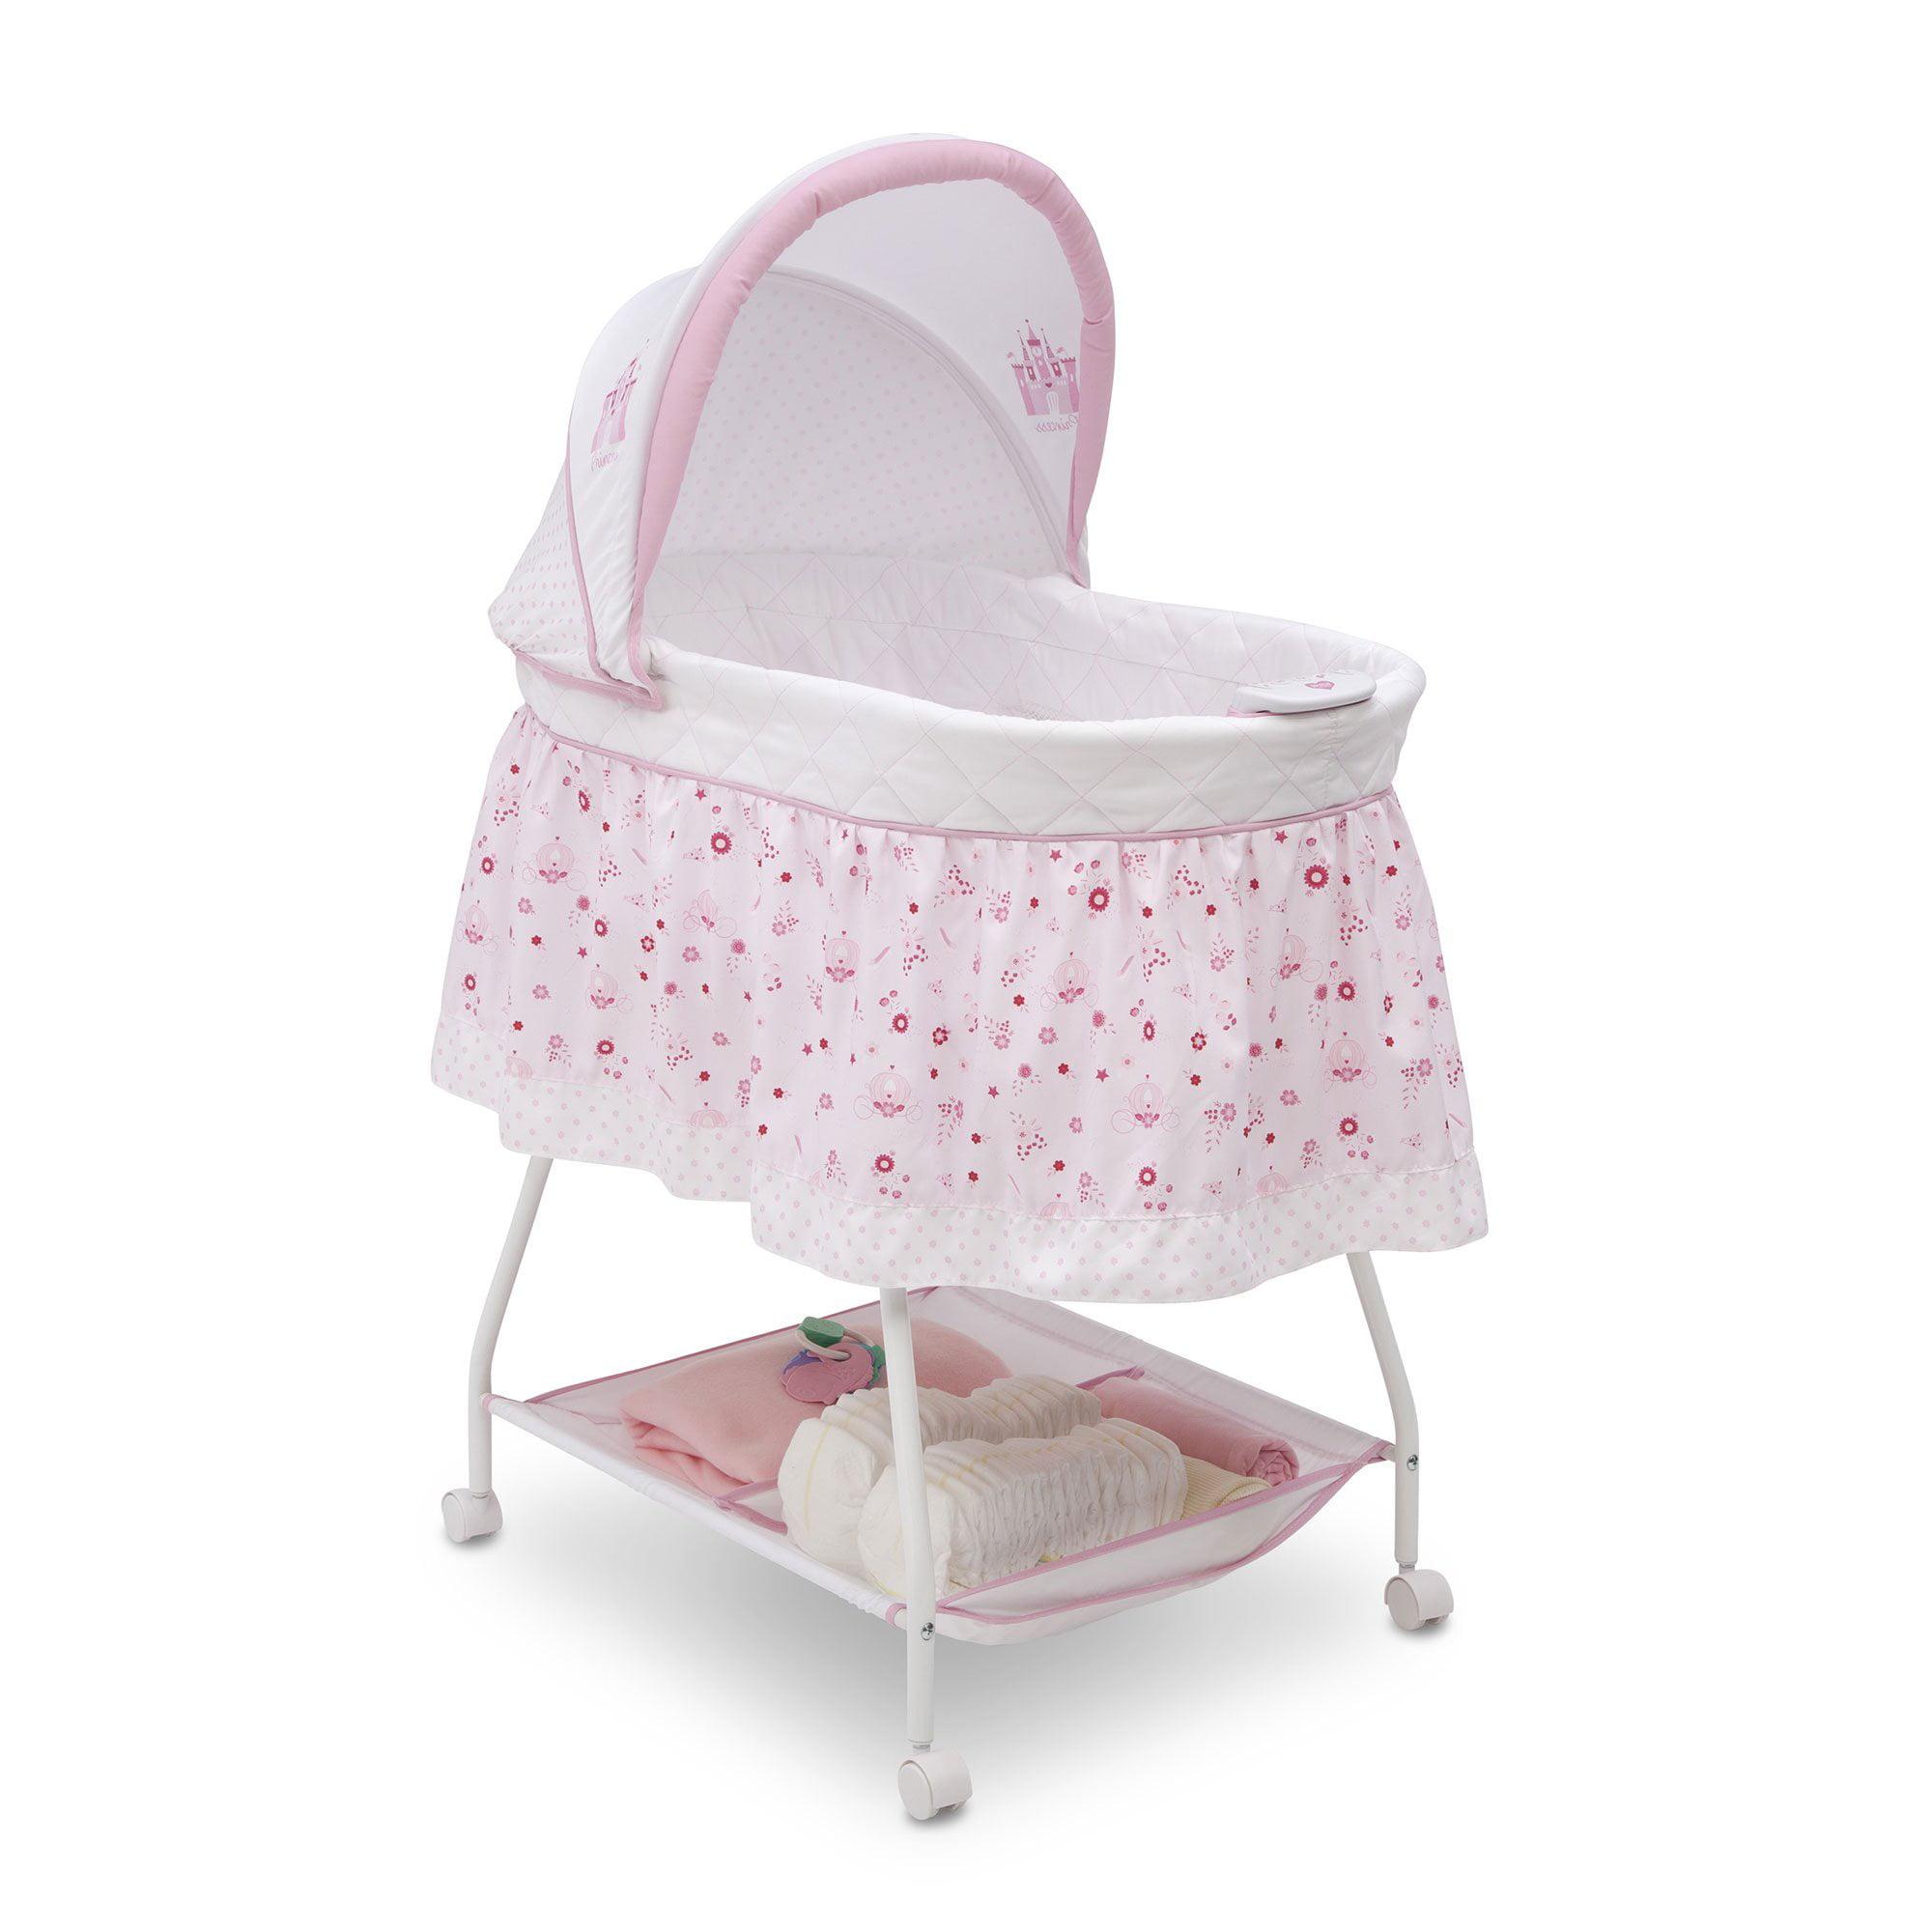 Disney Baby Ultimate Sweet Beginnings Bassinet, Disney Princess by Delta Children